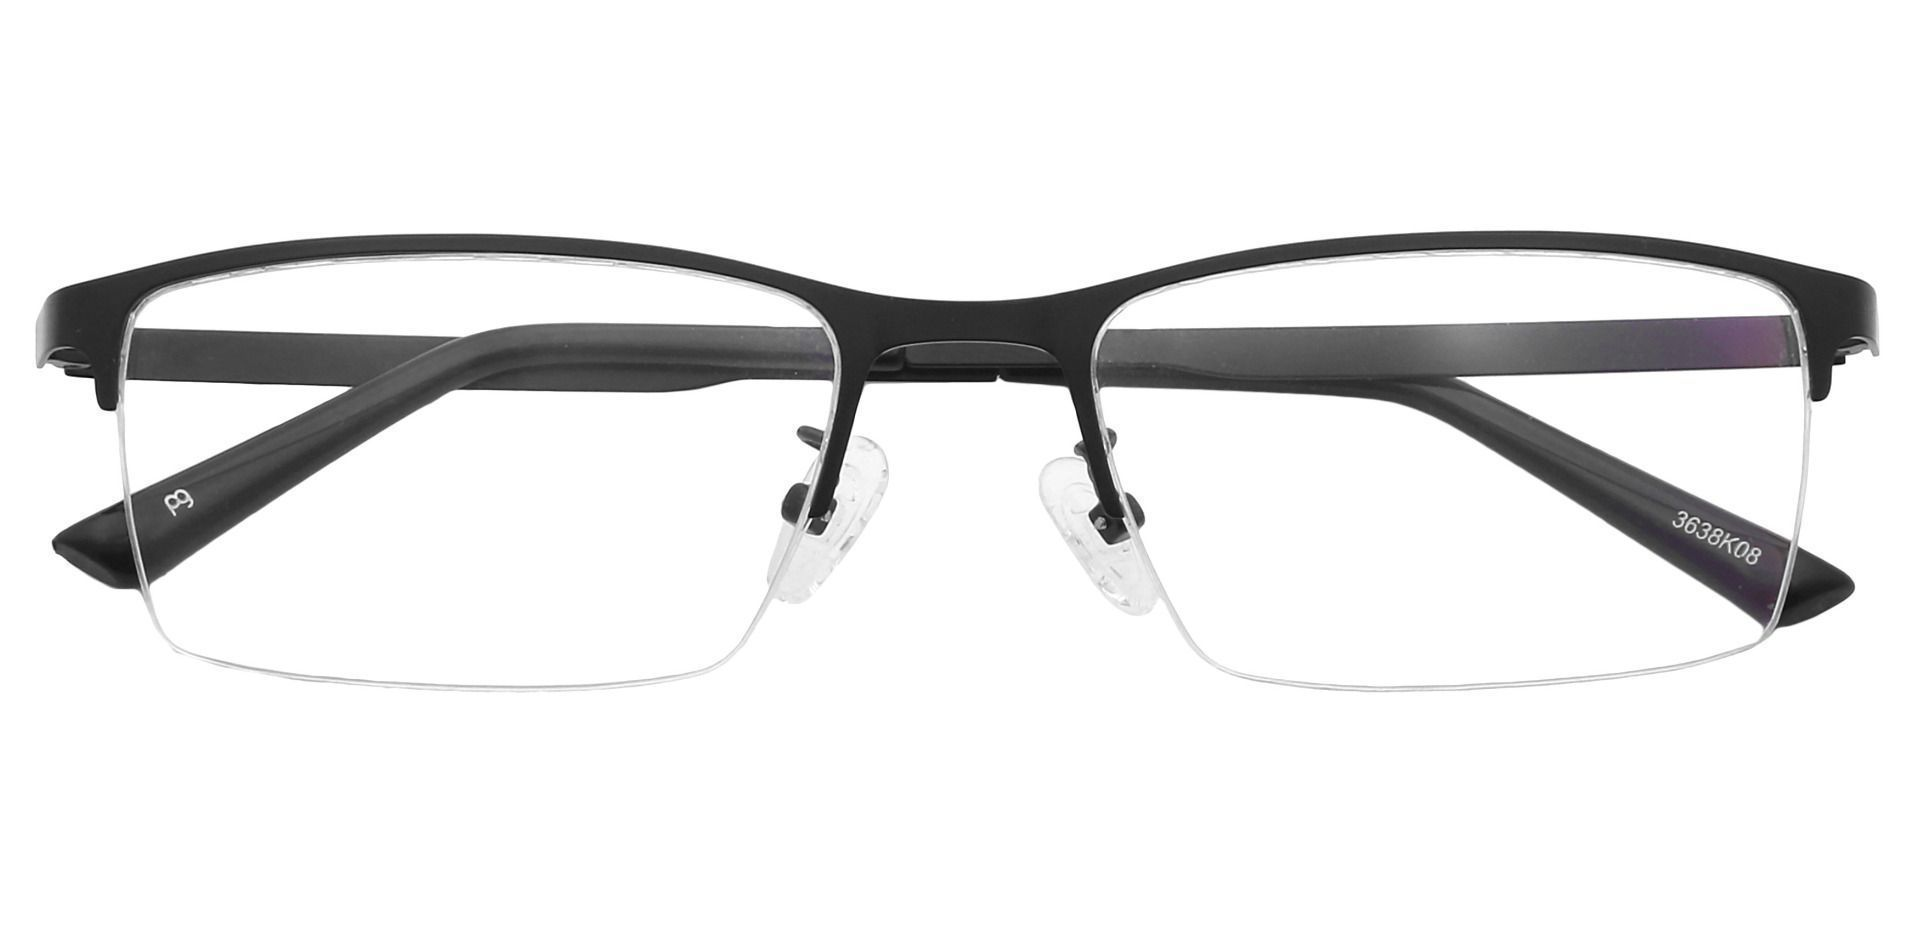 Rue Rectangle Lined Bifocal Glasses - Black